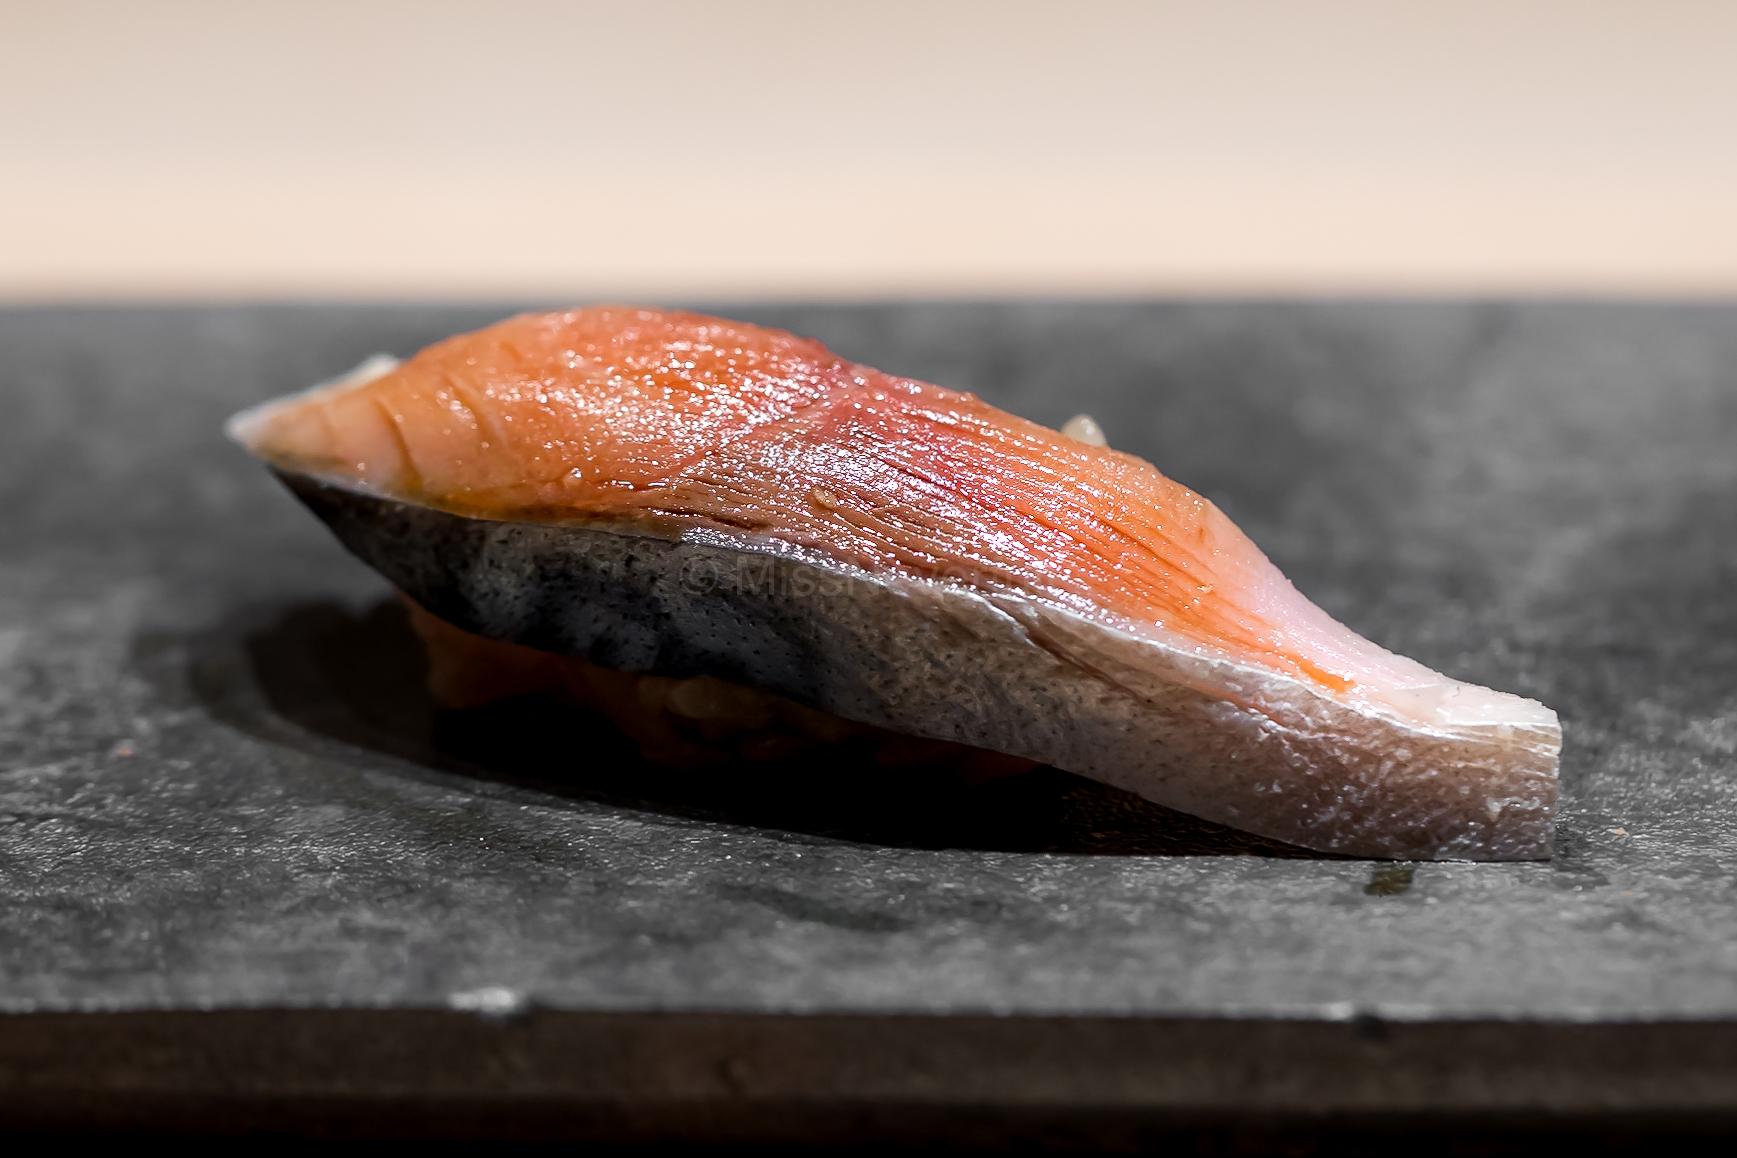 4. Shime-saba (cured mackerel)